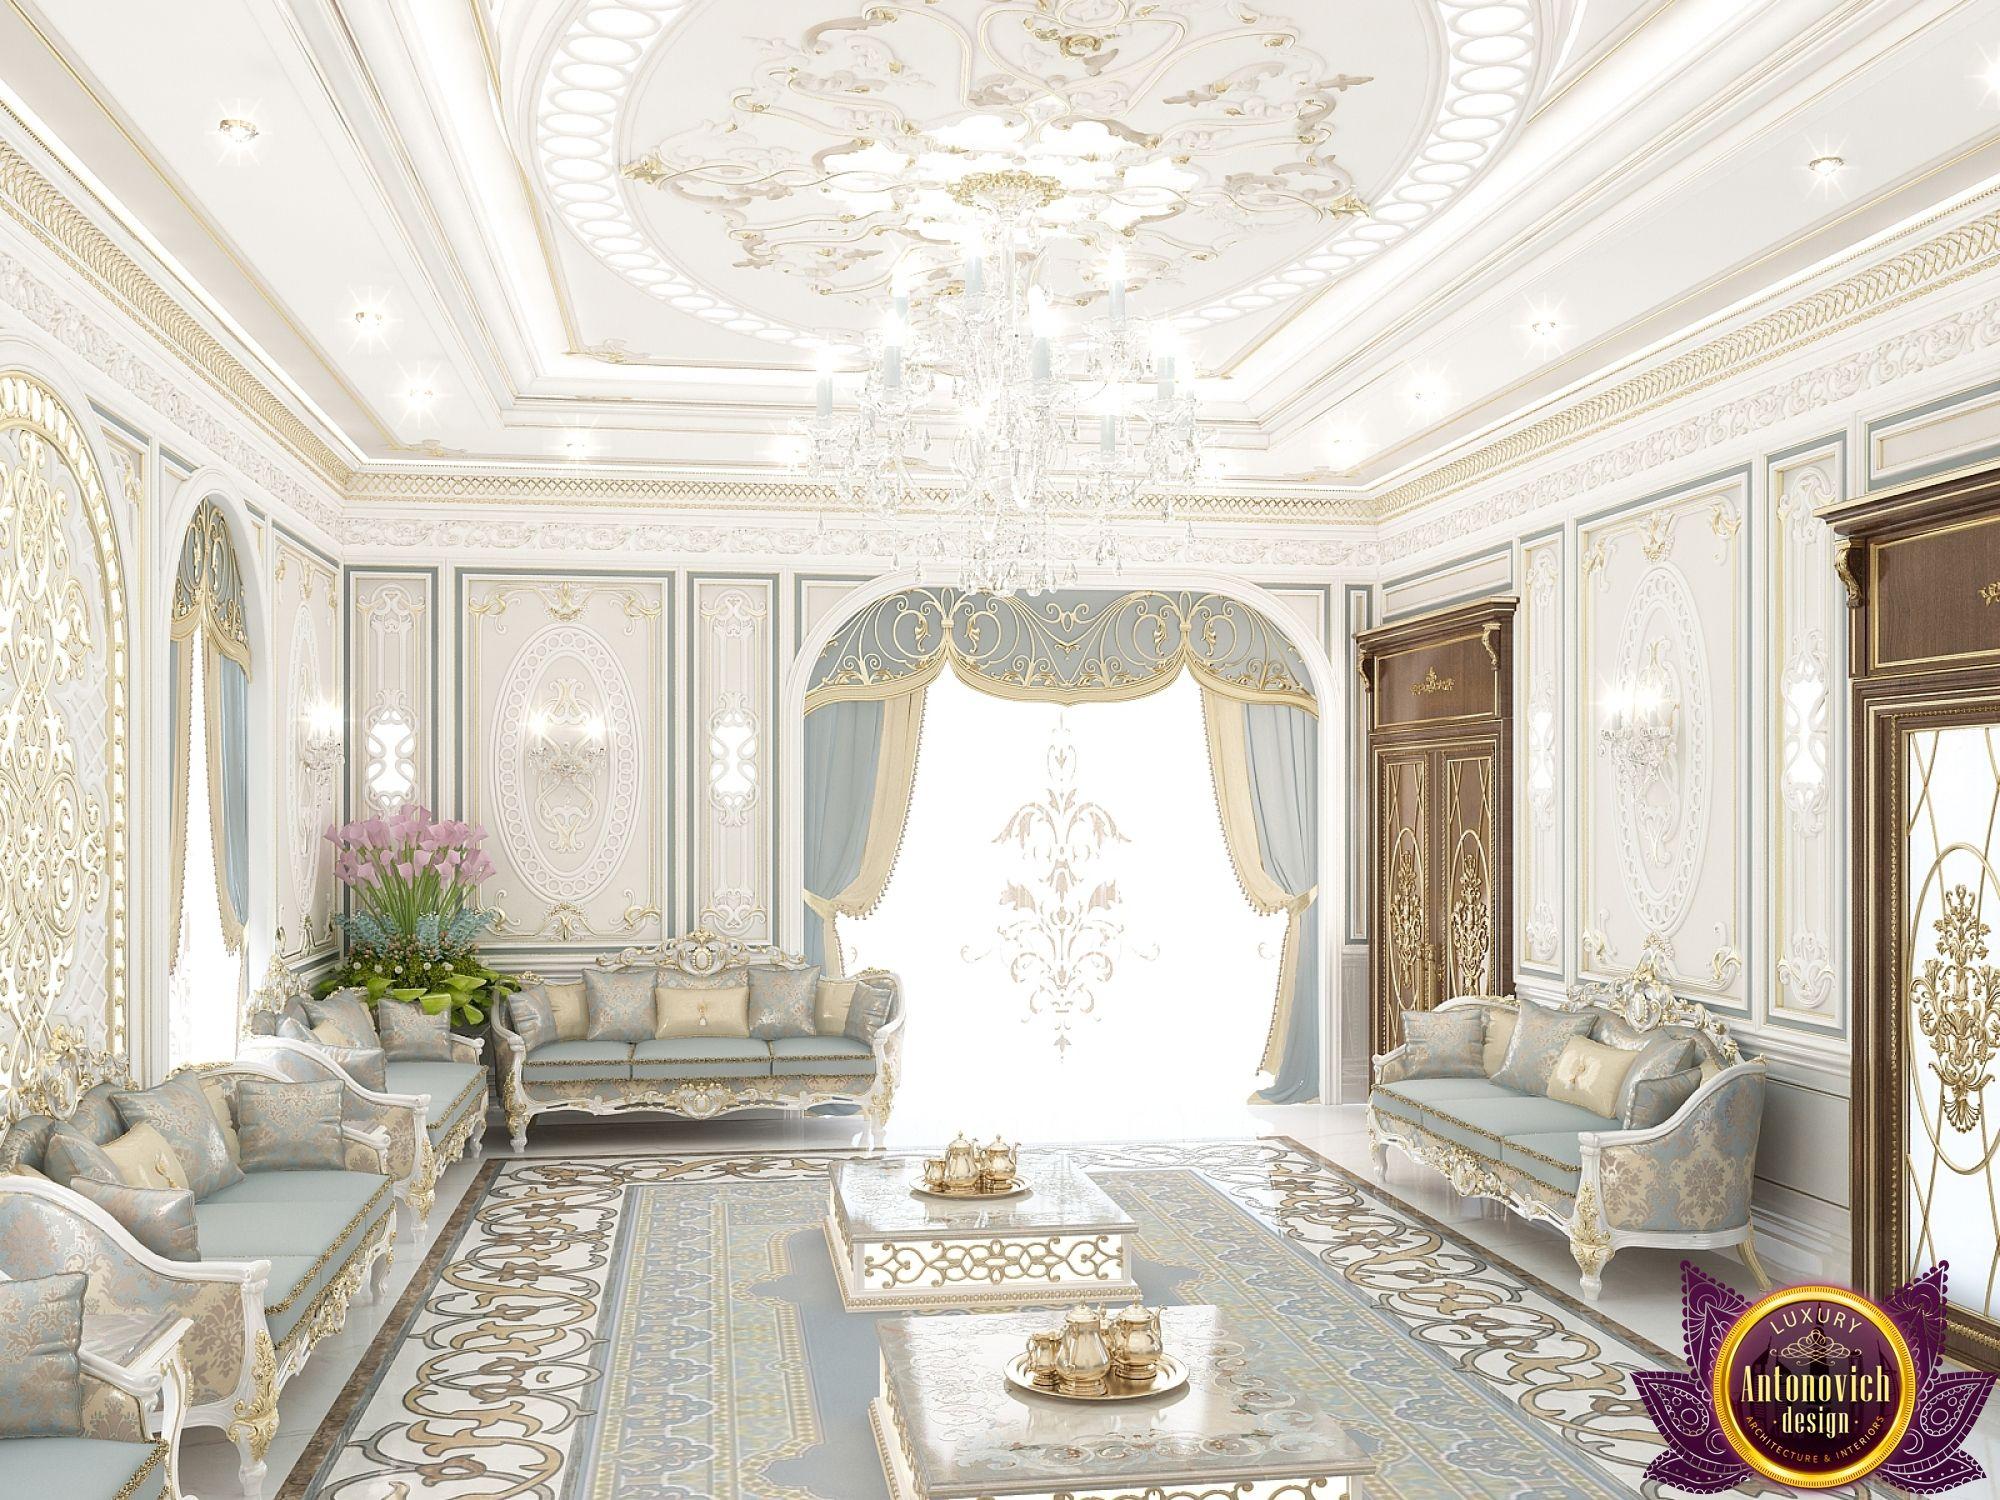 Majlis Interior Design In Dubai, Royal Majlis Design UAE, Photo 4